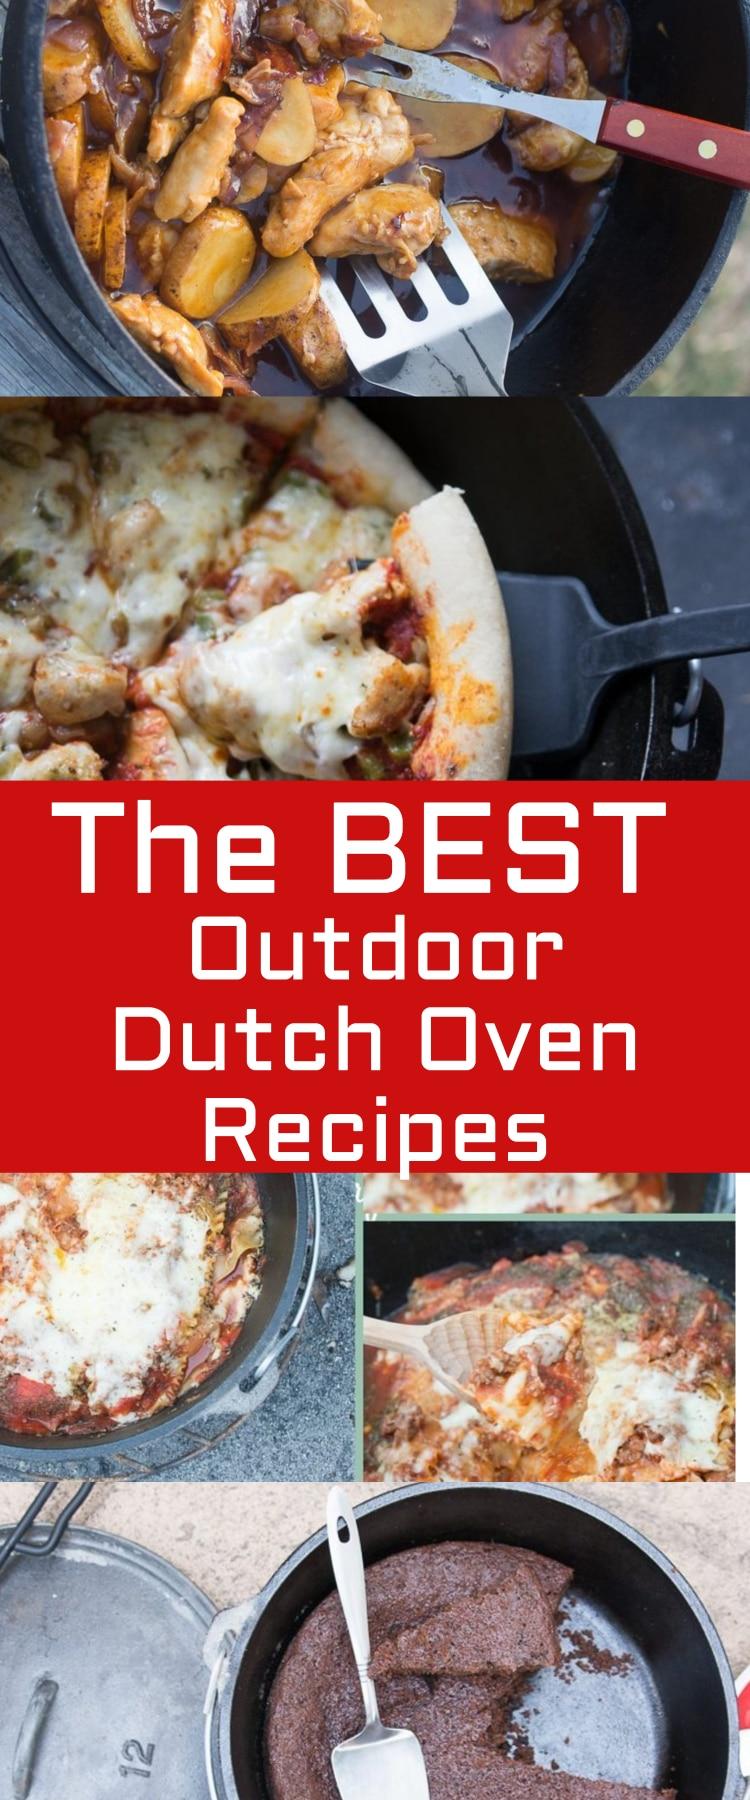 Dutch Oven Recipes / Best Dutch Oven Recipes / Dutch Oven Camping Recipes / Dutch Oven Camp Recipes